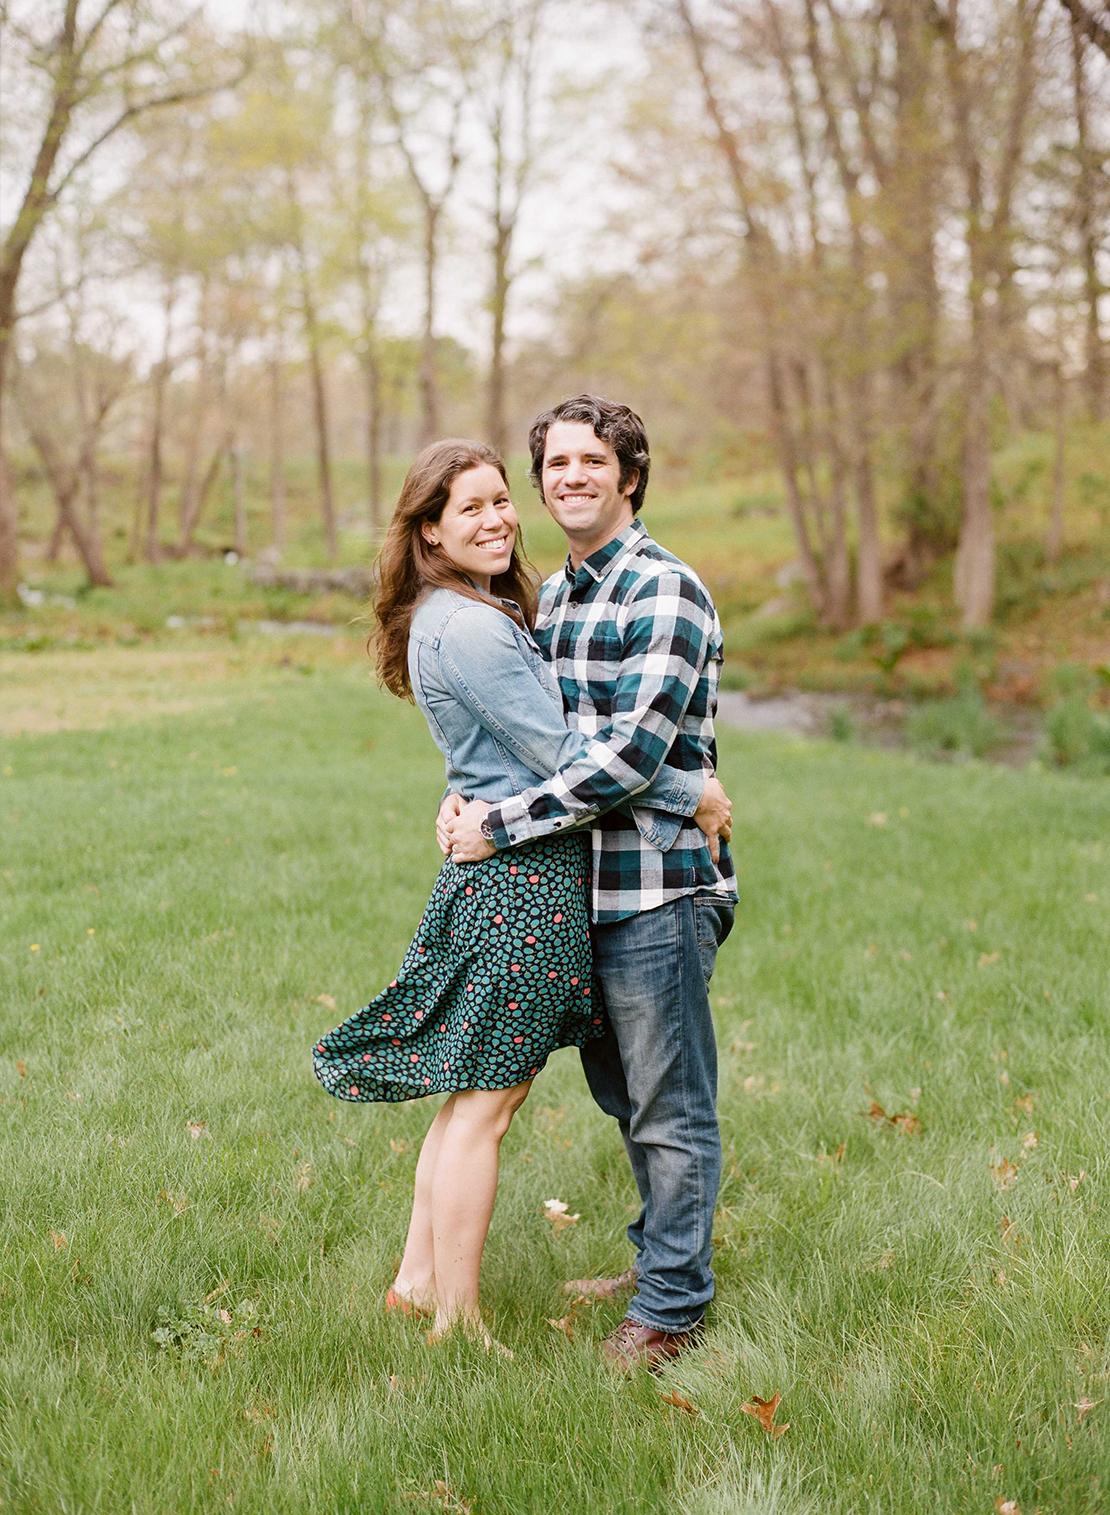 01_boston_wedding_photographer_heidi_vail_sudbury_engagement_grist_mill